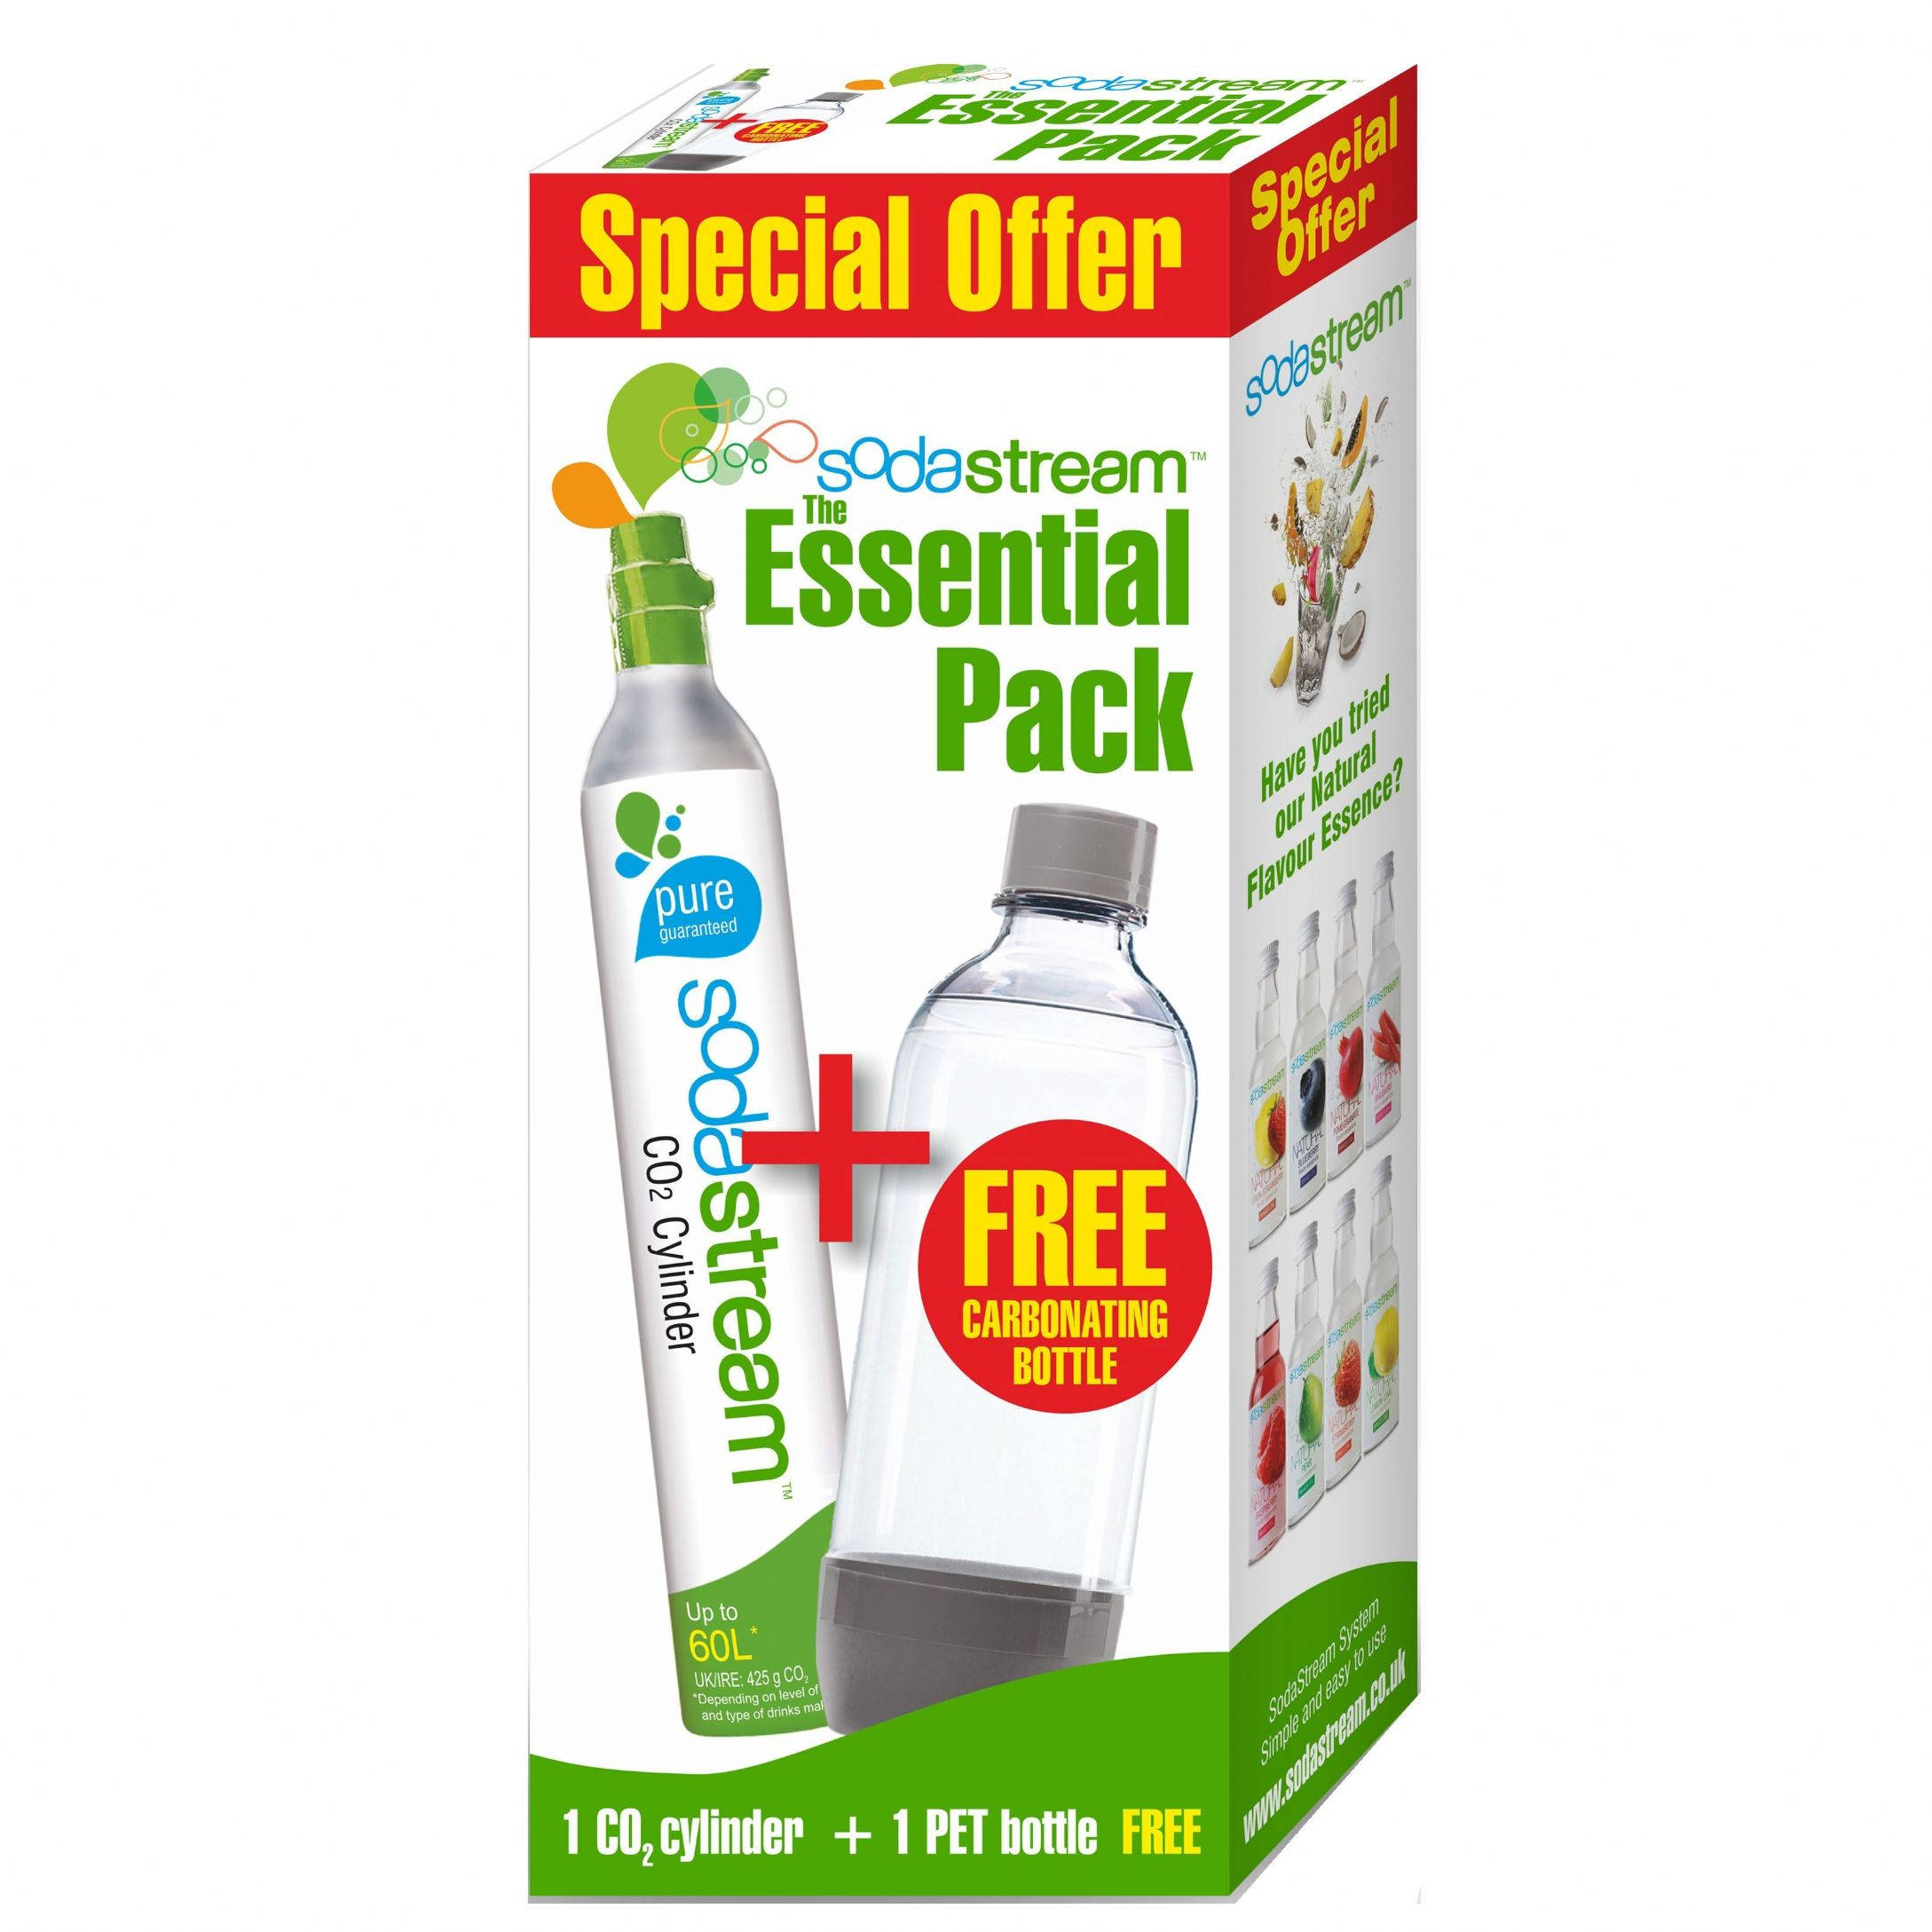 sodastream essential pack spare co2 60l gas cylinder free carbonating bottle. Black Bedroom Furniture Sets. Home Design Ideas